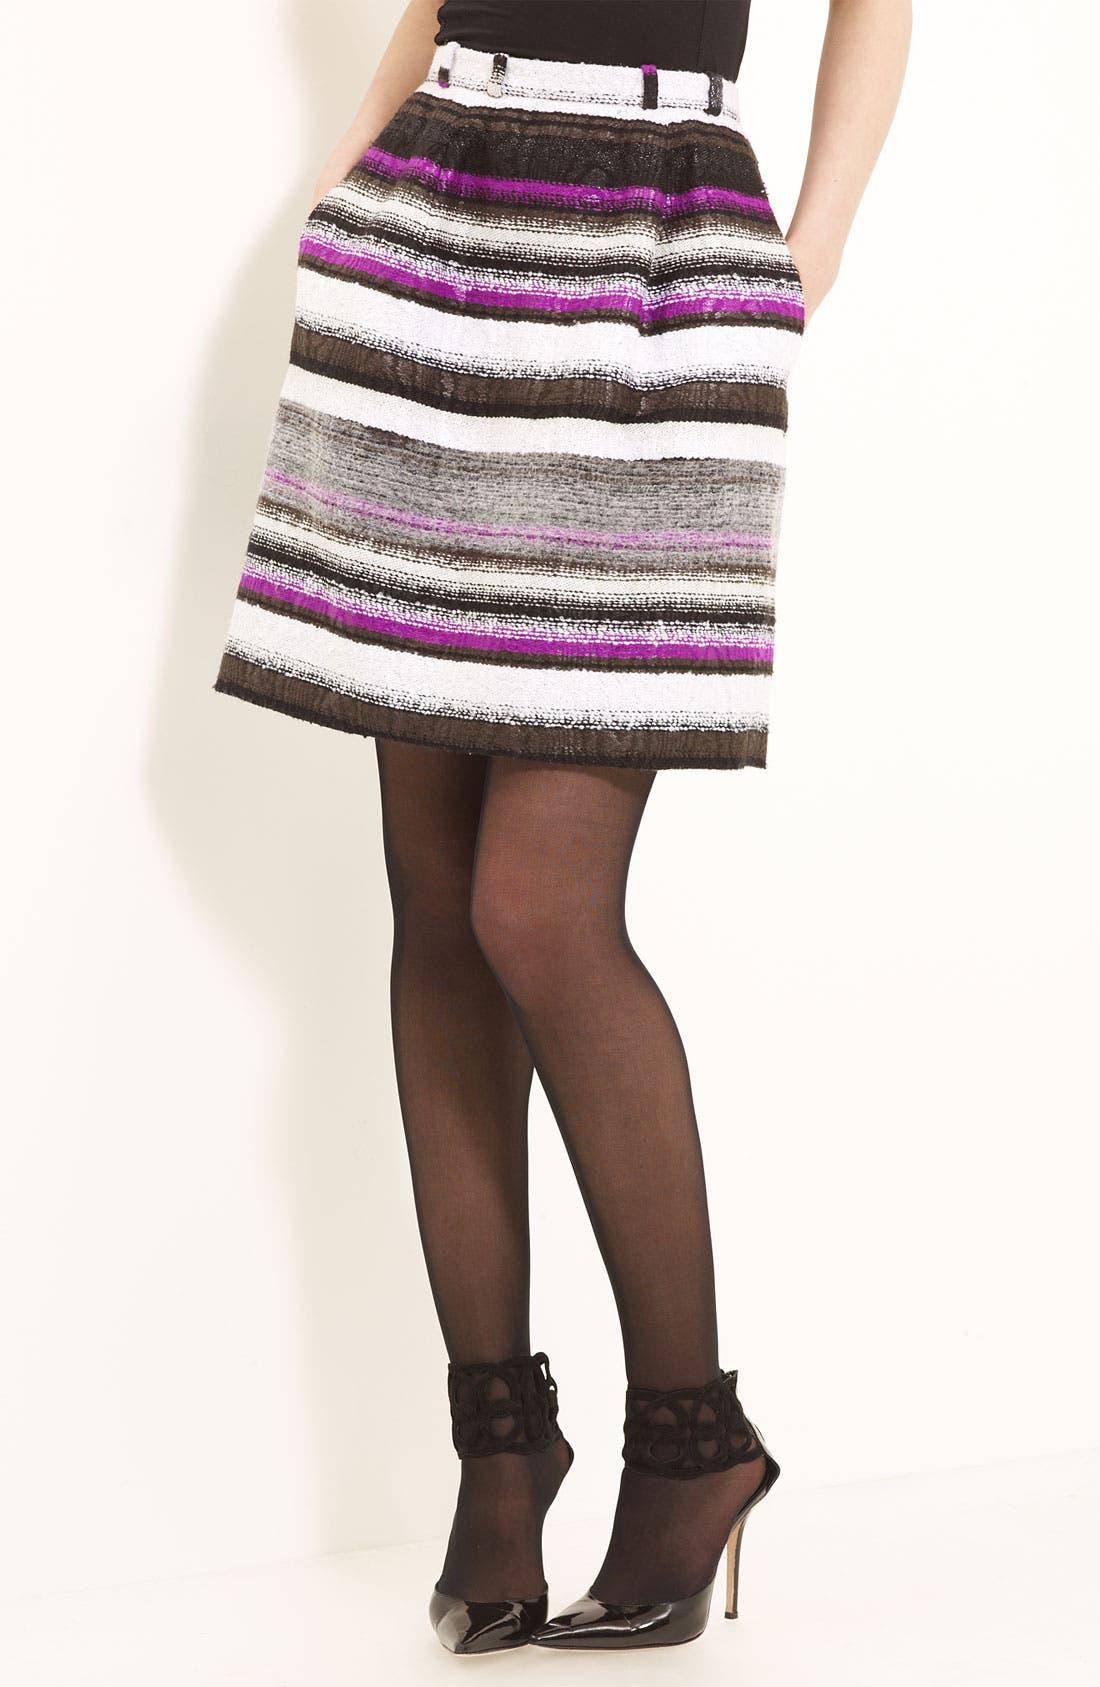 Alternate Image 1 Selected - Oscar de la Renta Colorblock Tweed Skirt